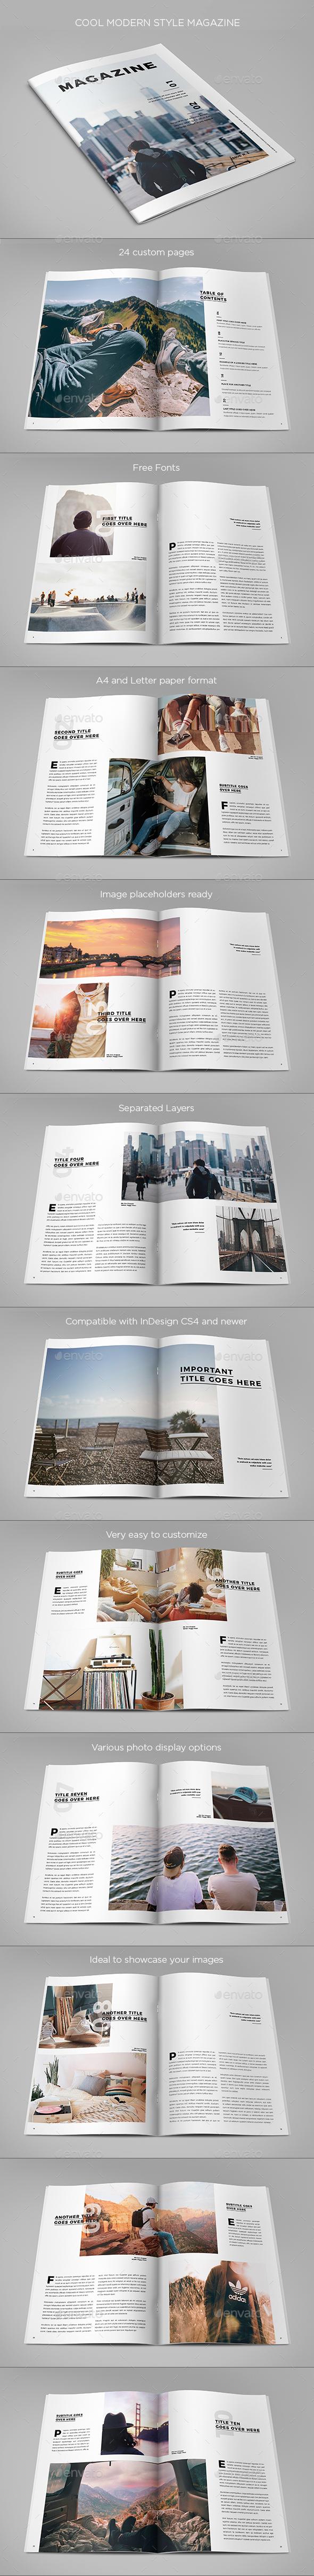 GraphicRiver Cool Modern Style Magazine 20448744